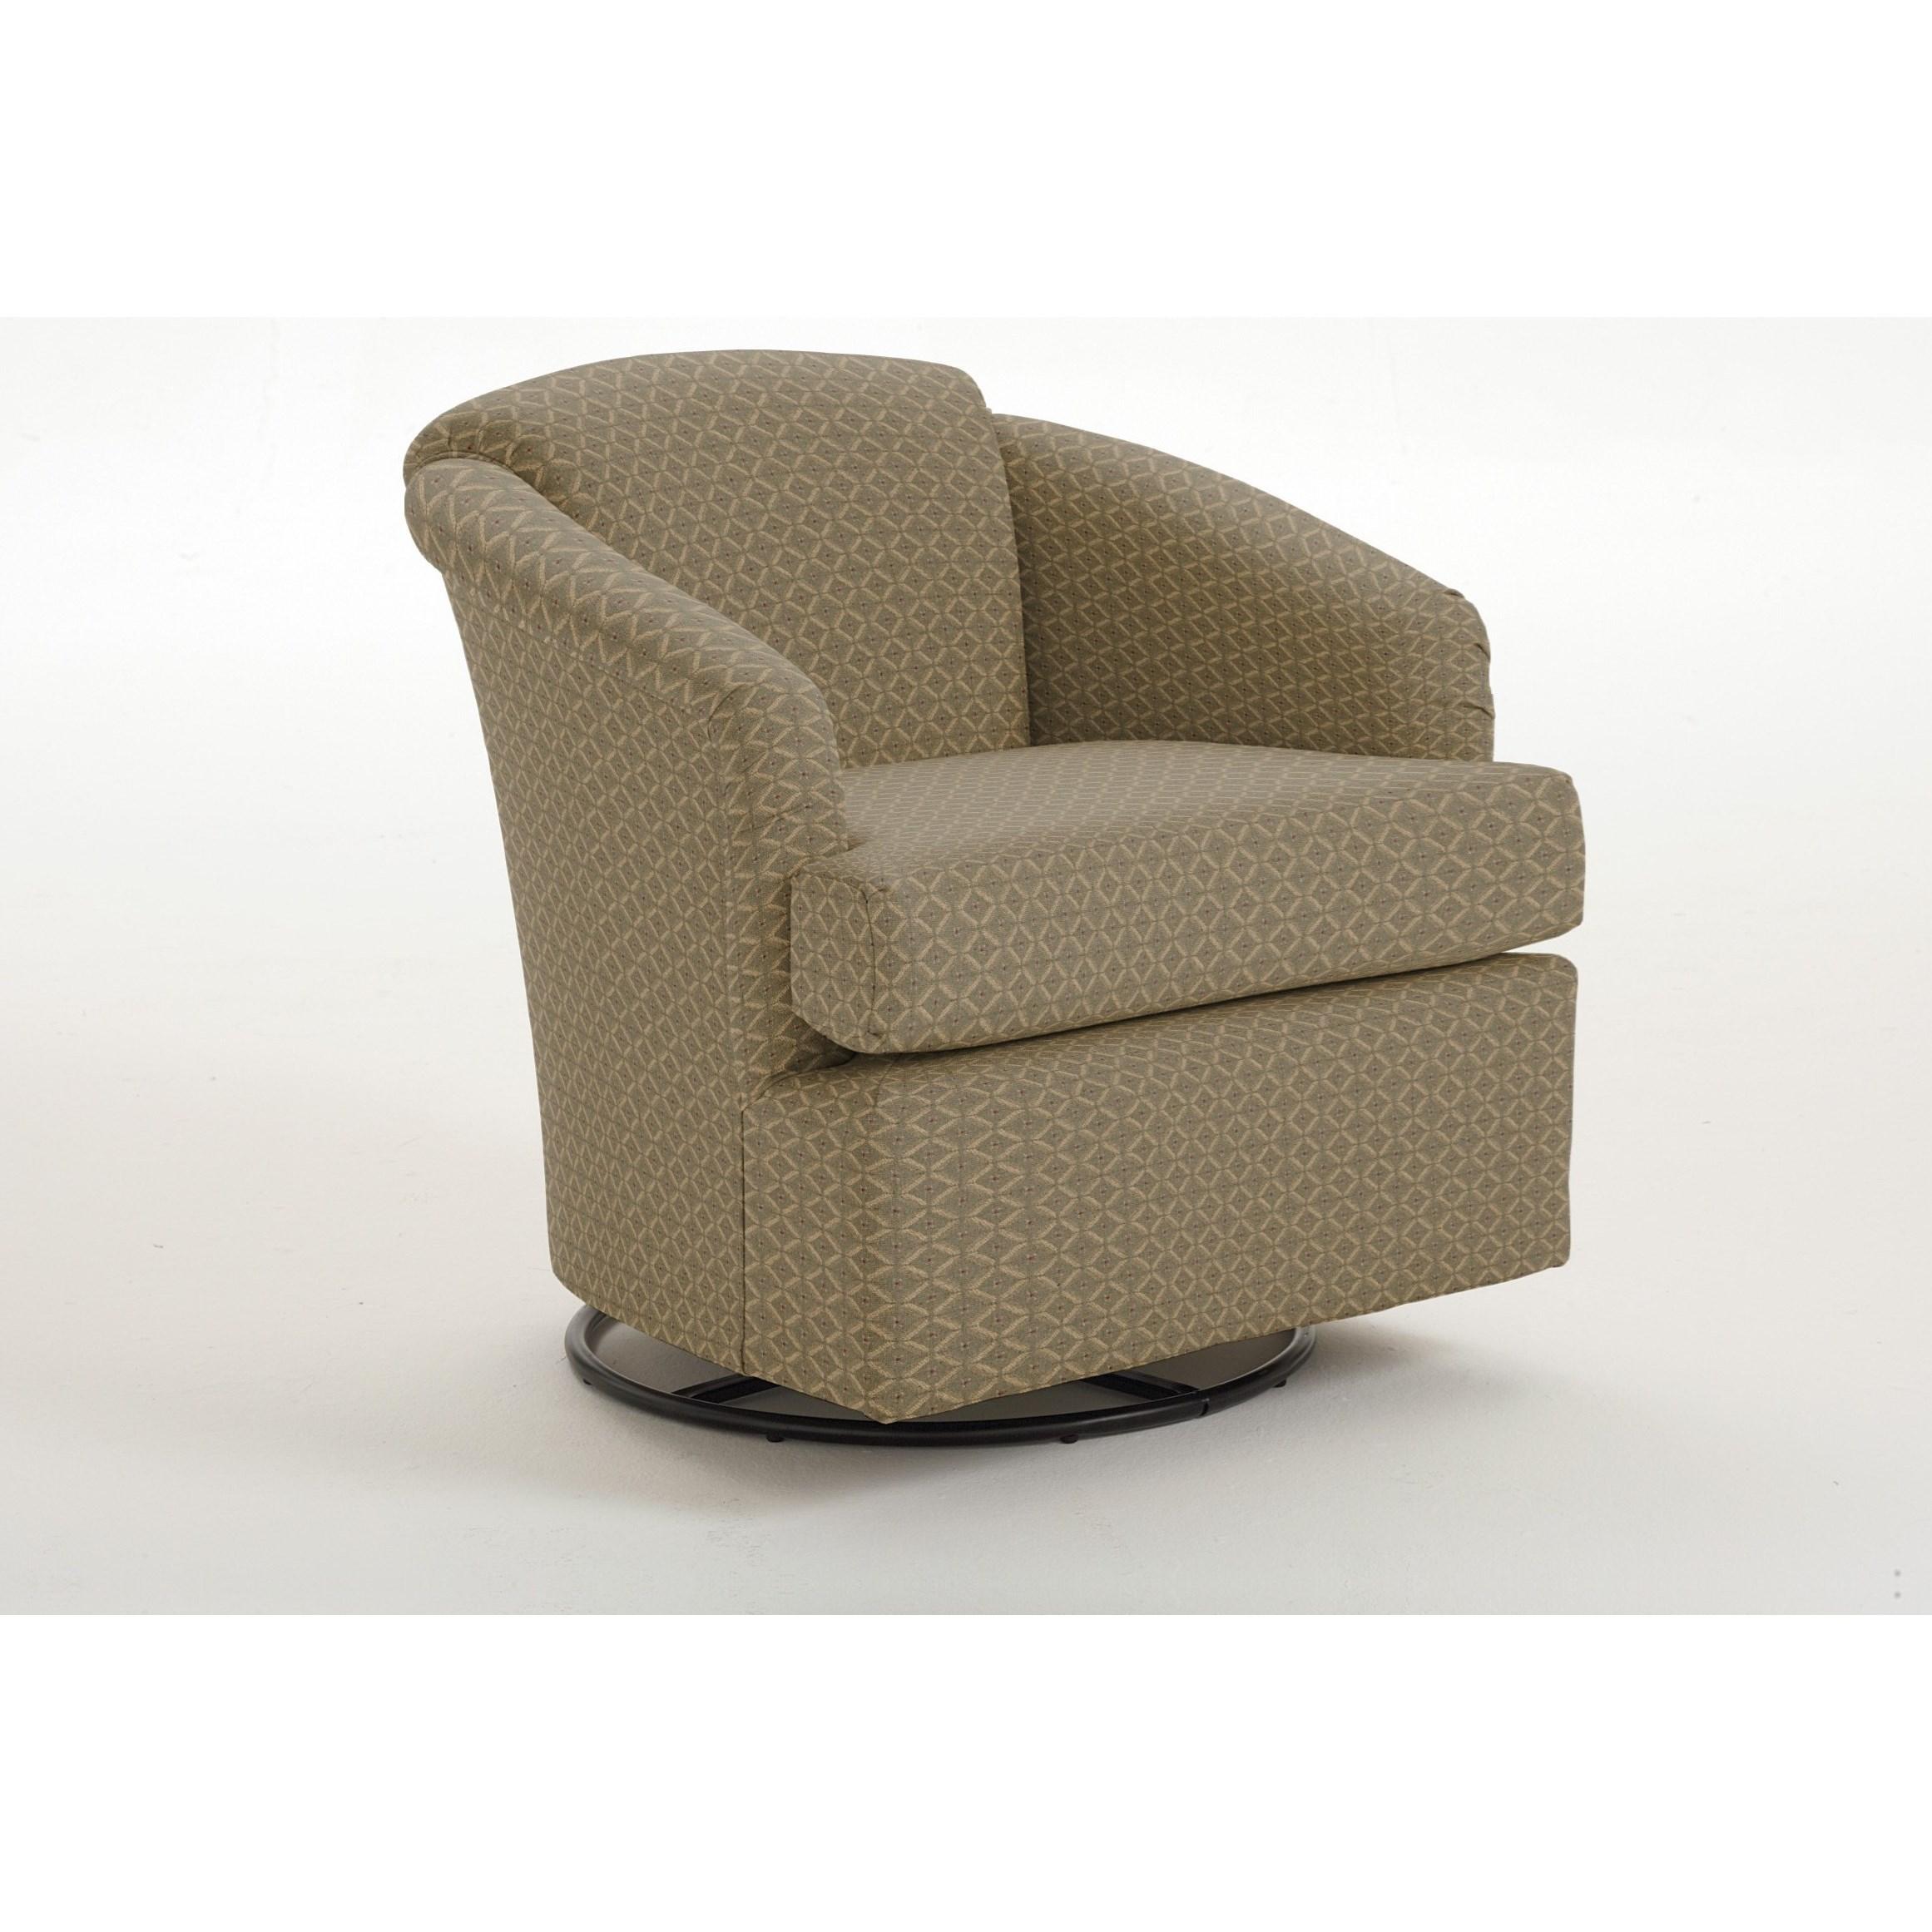 Chairs - Swivel Barrel Cass Swivel Barrel Chair by Best Home Furnishings at Lapeer Furniture & Mattress Center